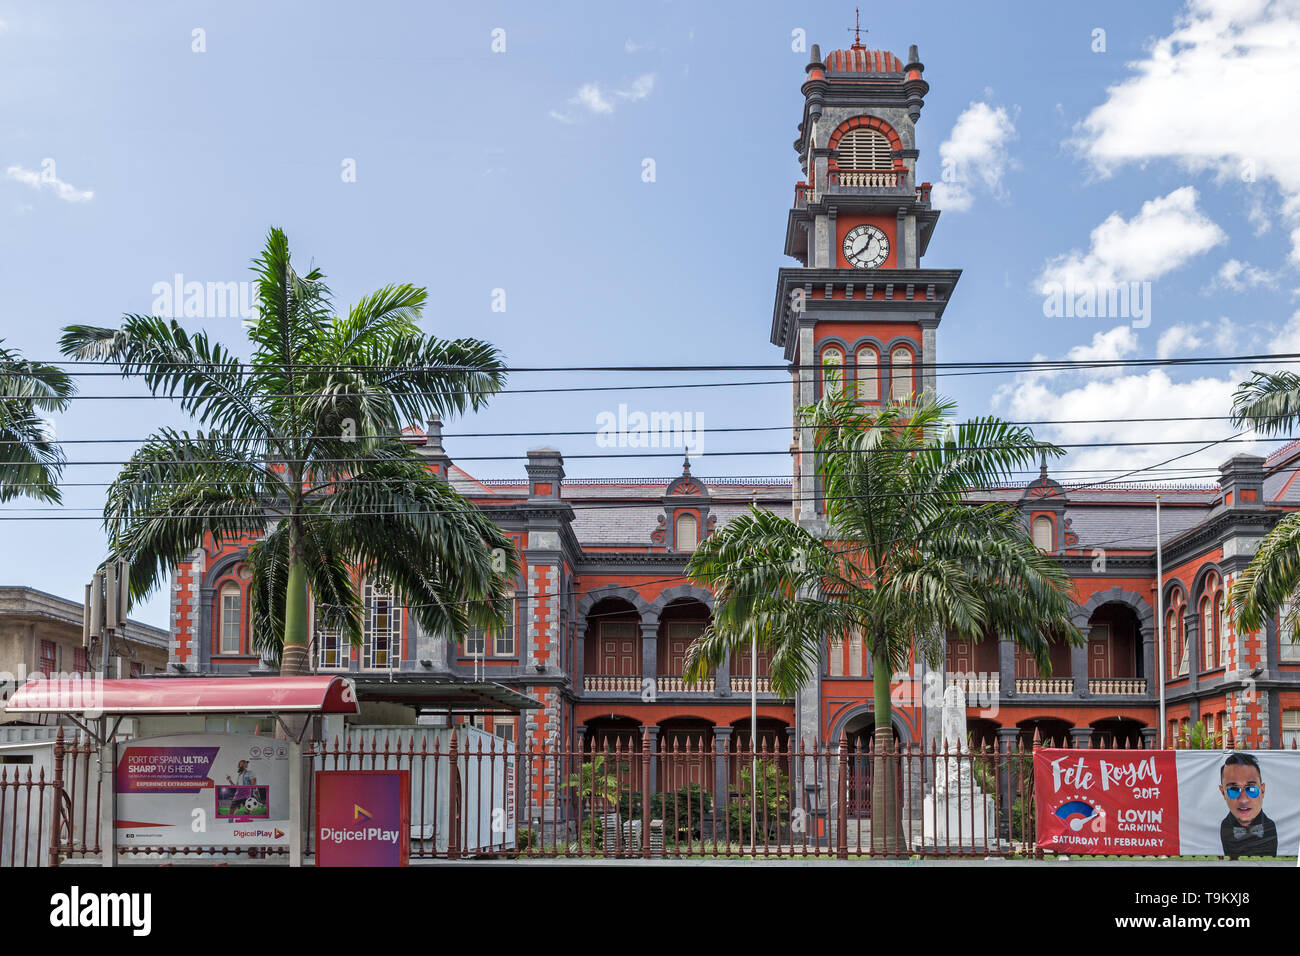 Queen's Royal College, Magnificent Seven House, Queen's Park Savannah, Port of Spain, Trinidad & Tobago - Stock Image